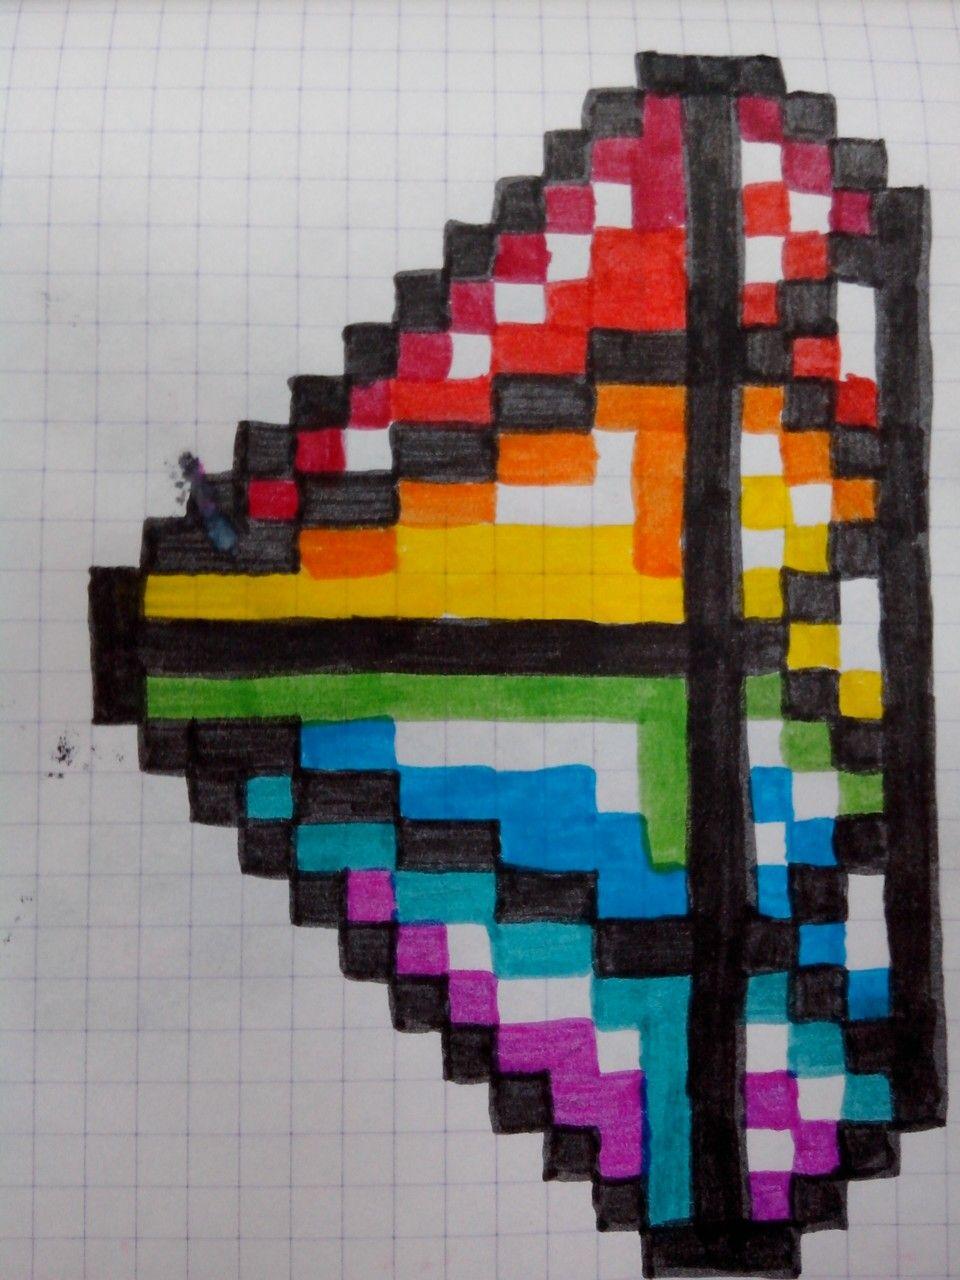 Pixel Art Pixel Art Embroidered Friendship Bracelet Art